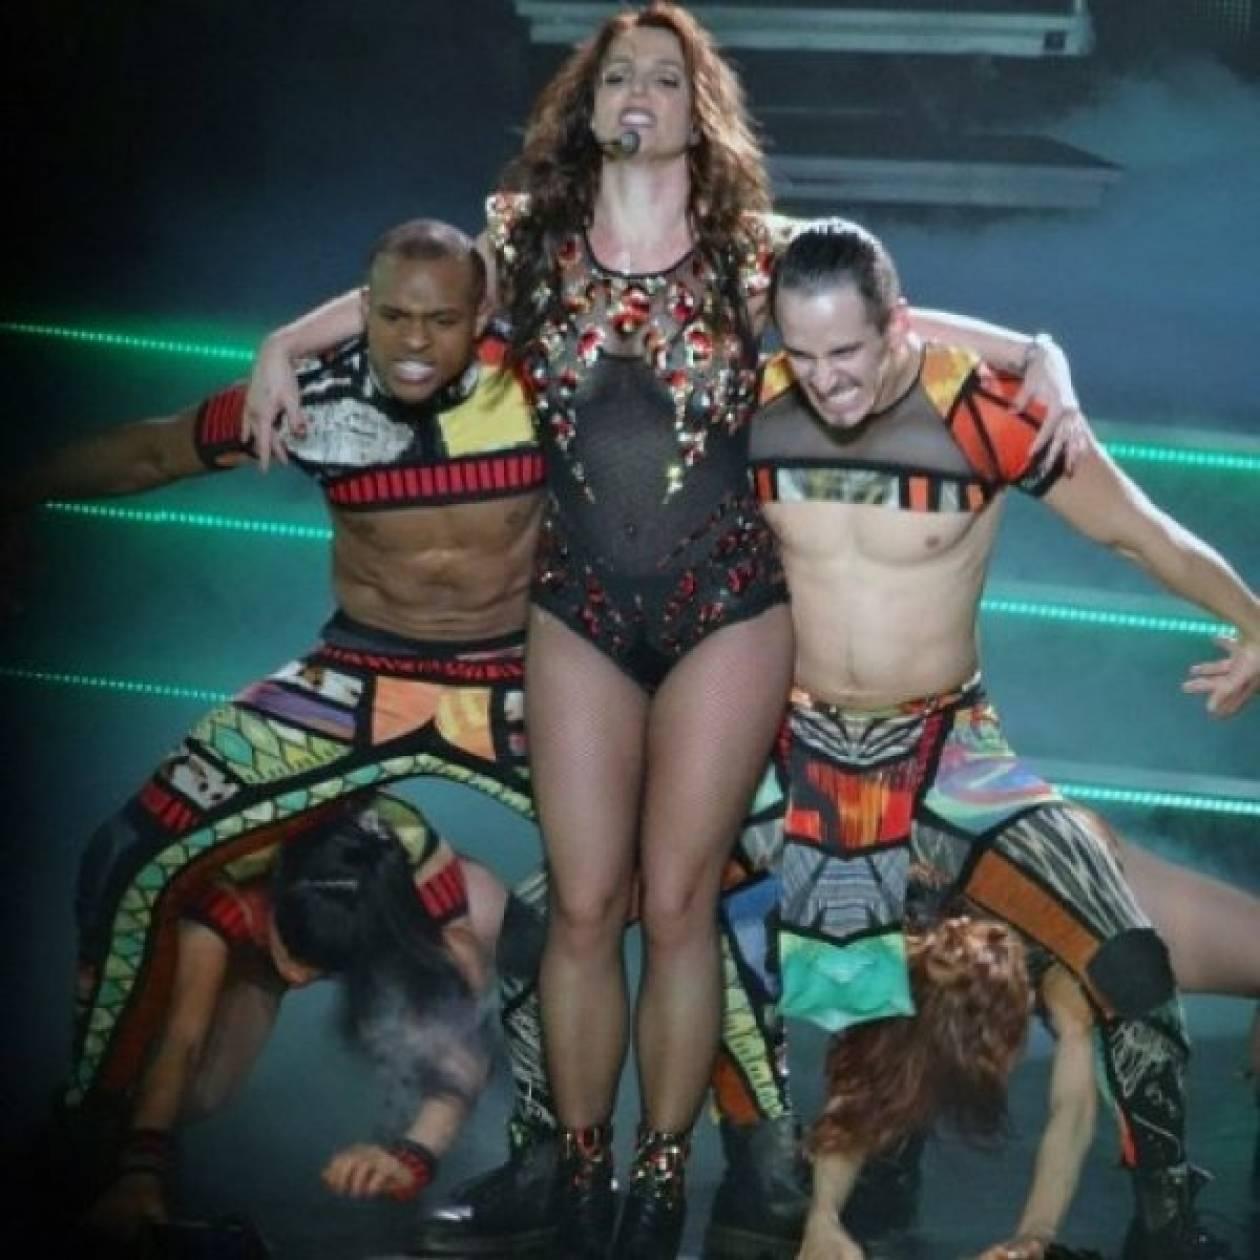 Kαημενούλα Britney! Γιατί έγινε ρόμπα επί σκηνής;